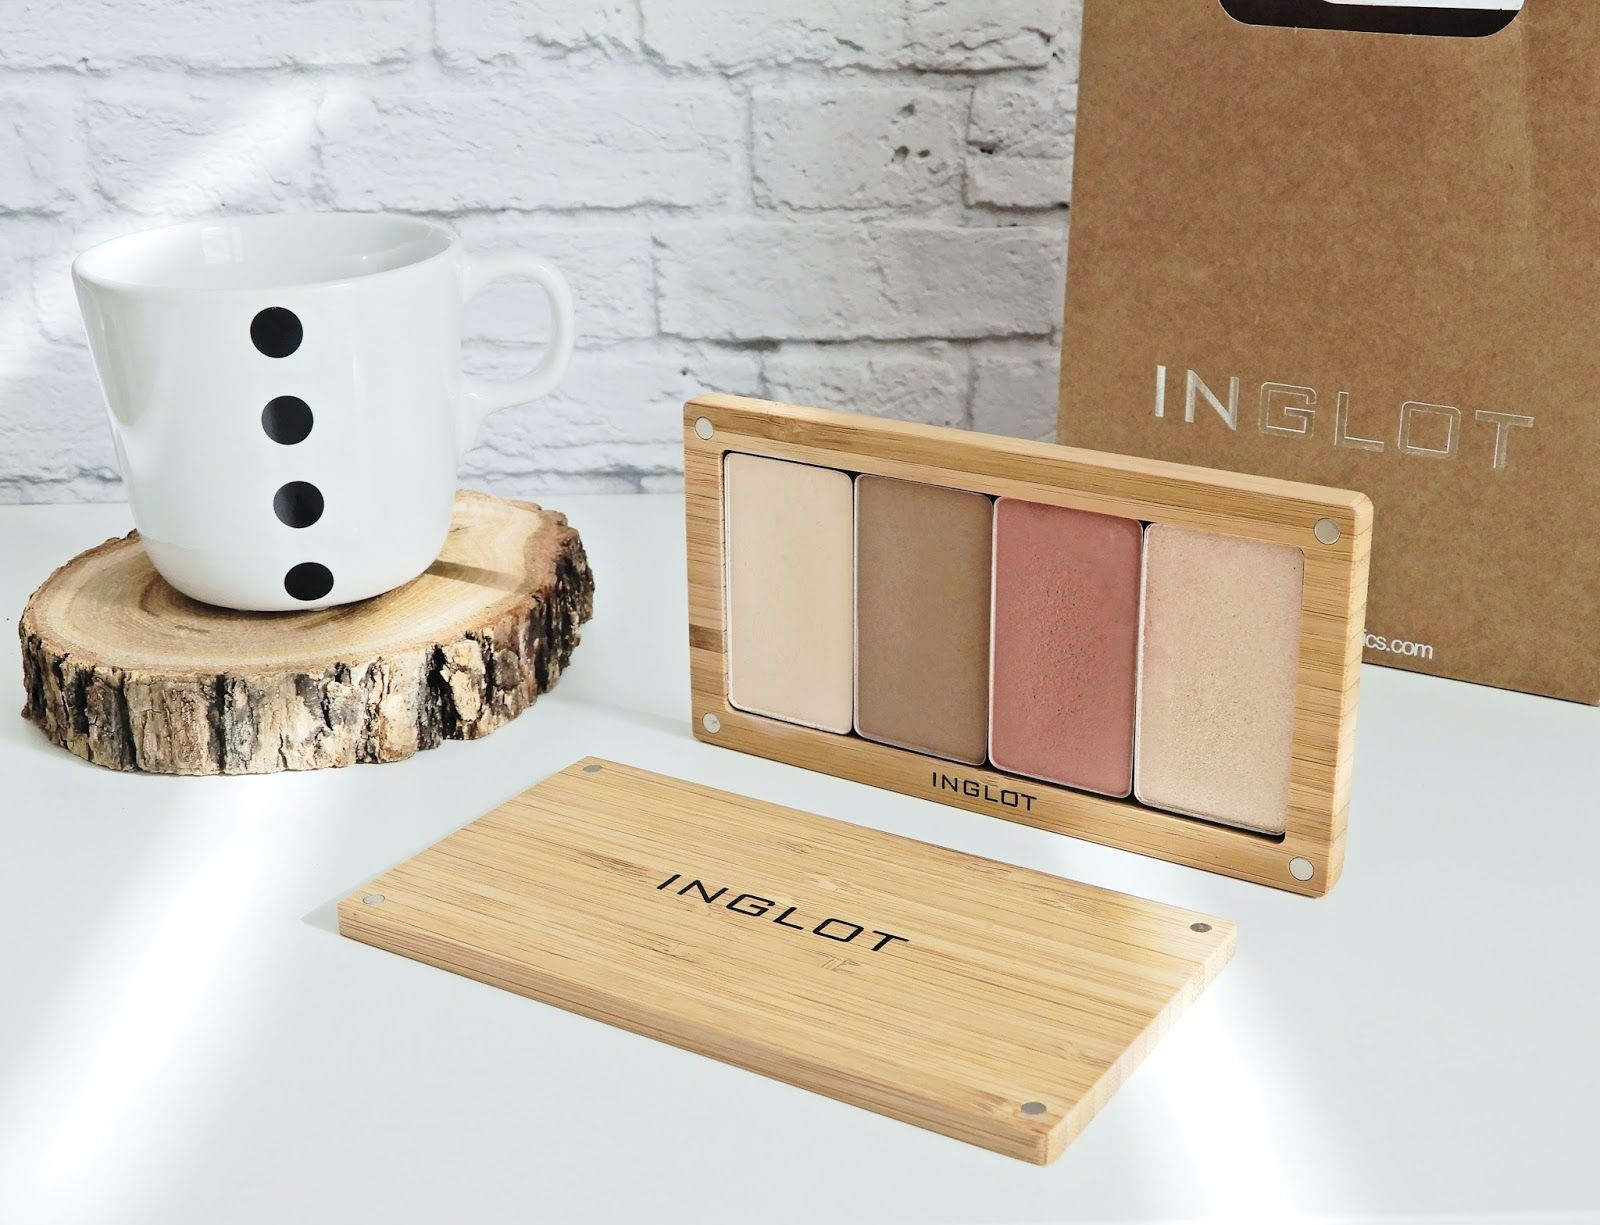 Pod lupą. INGLOT Inglot, Inglot makeup, Cruelty free makeup